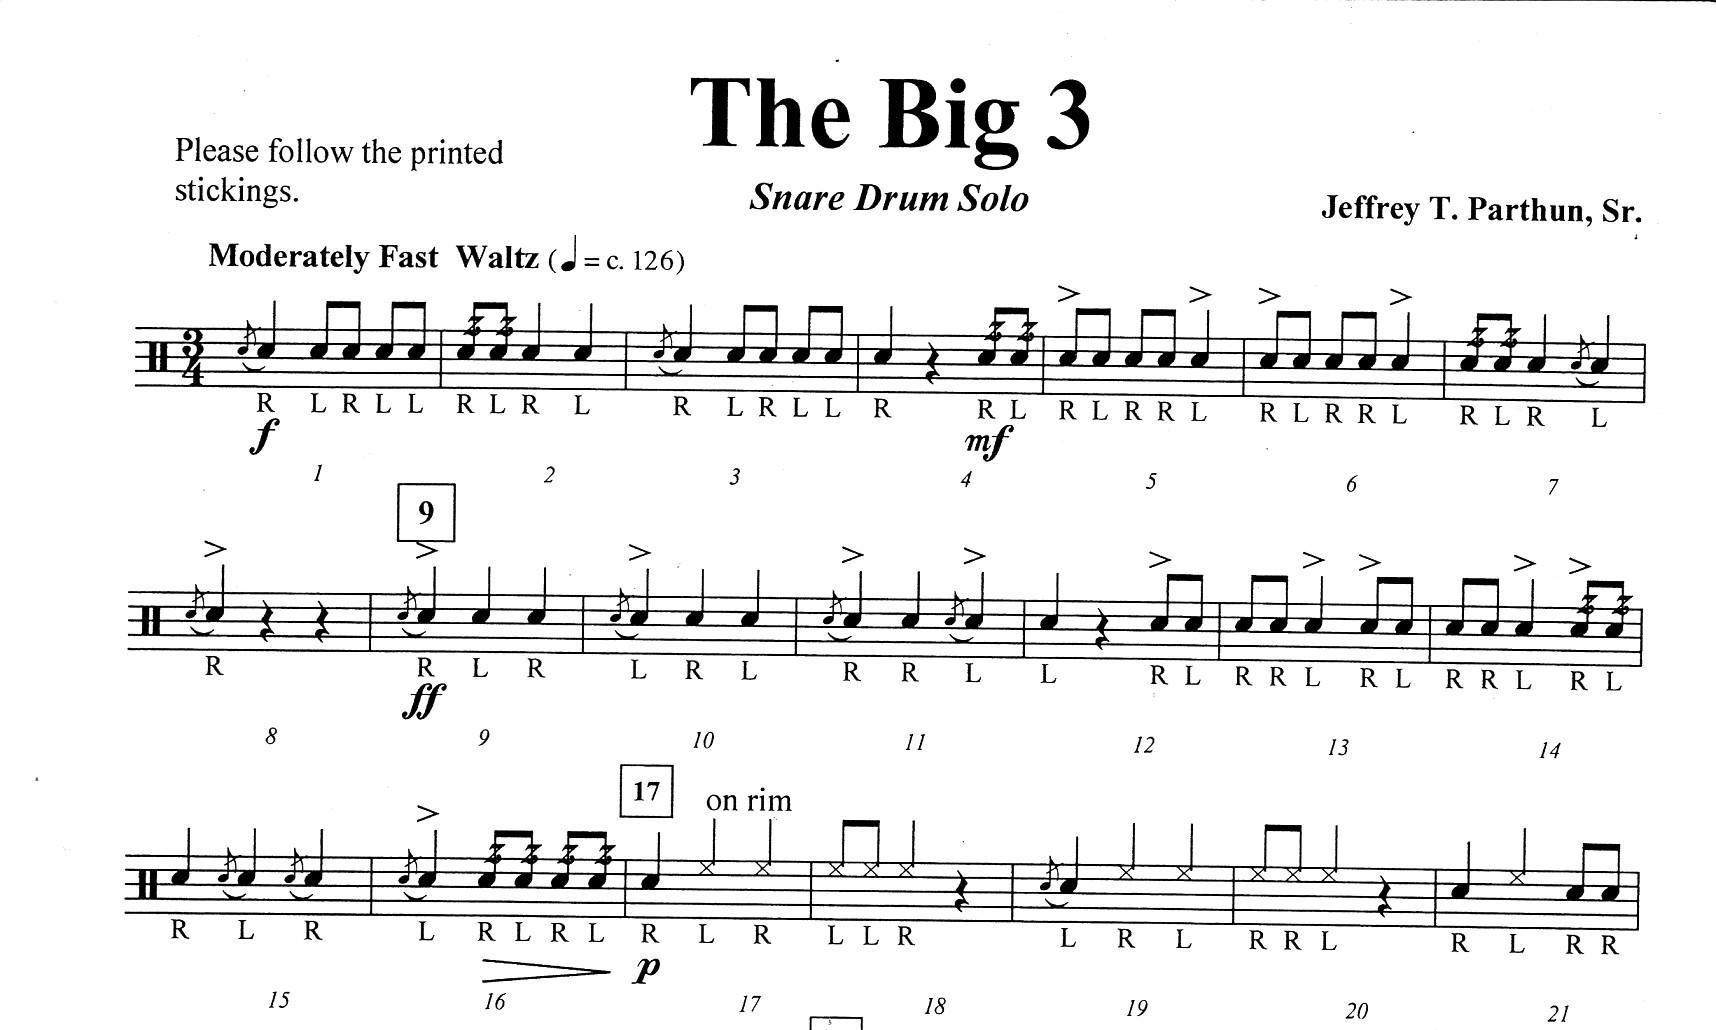 parthun jeffrey t the big 3 for snare drum solo brandt percussion noten versand. Black Bedroom Furniture Sets. Home Design Ideas